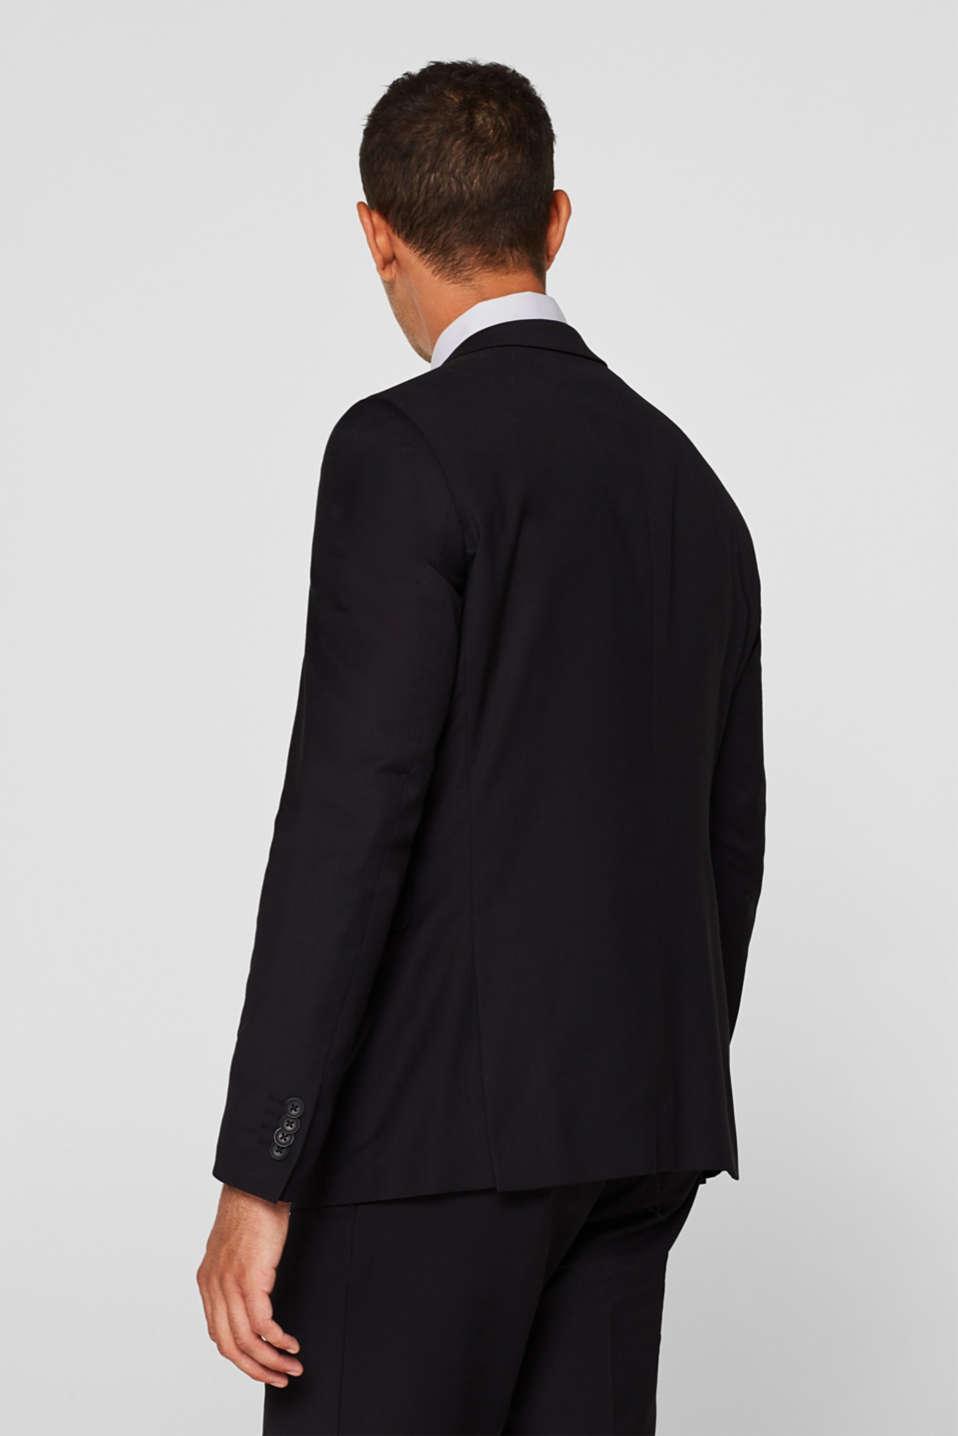 Blazers suit, BLACK, detail image number 3